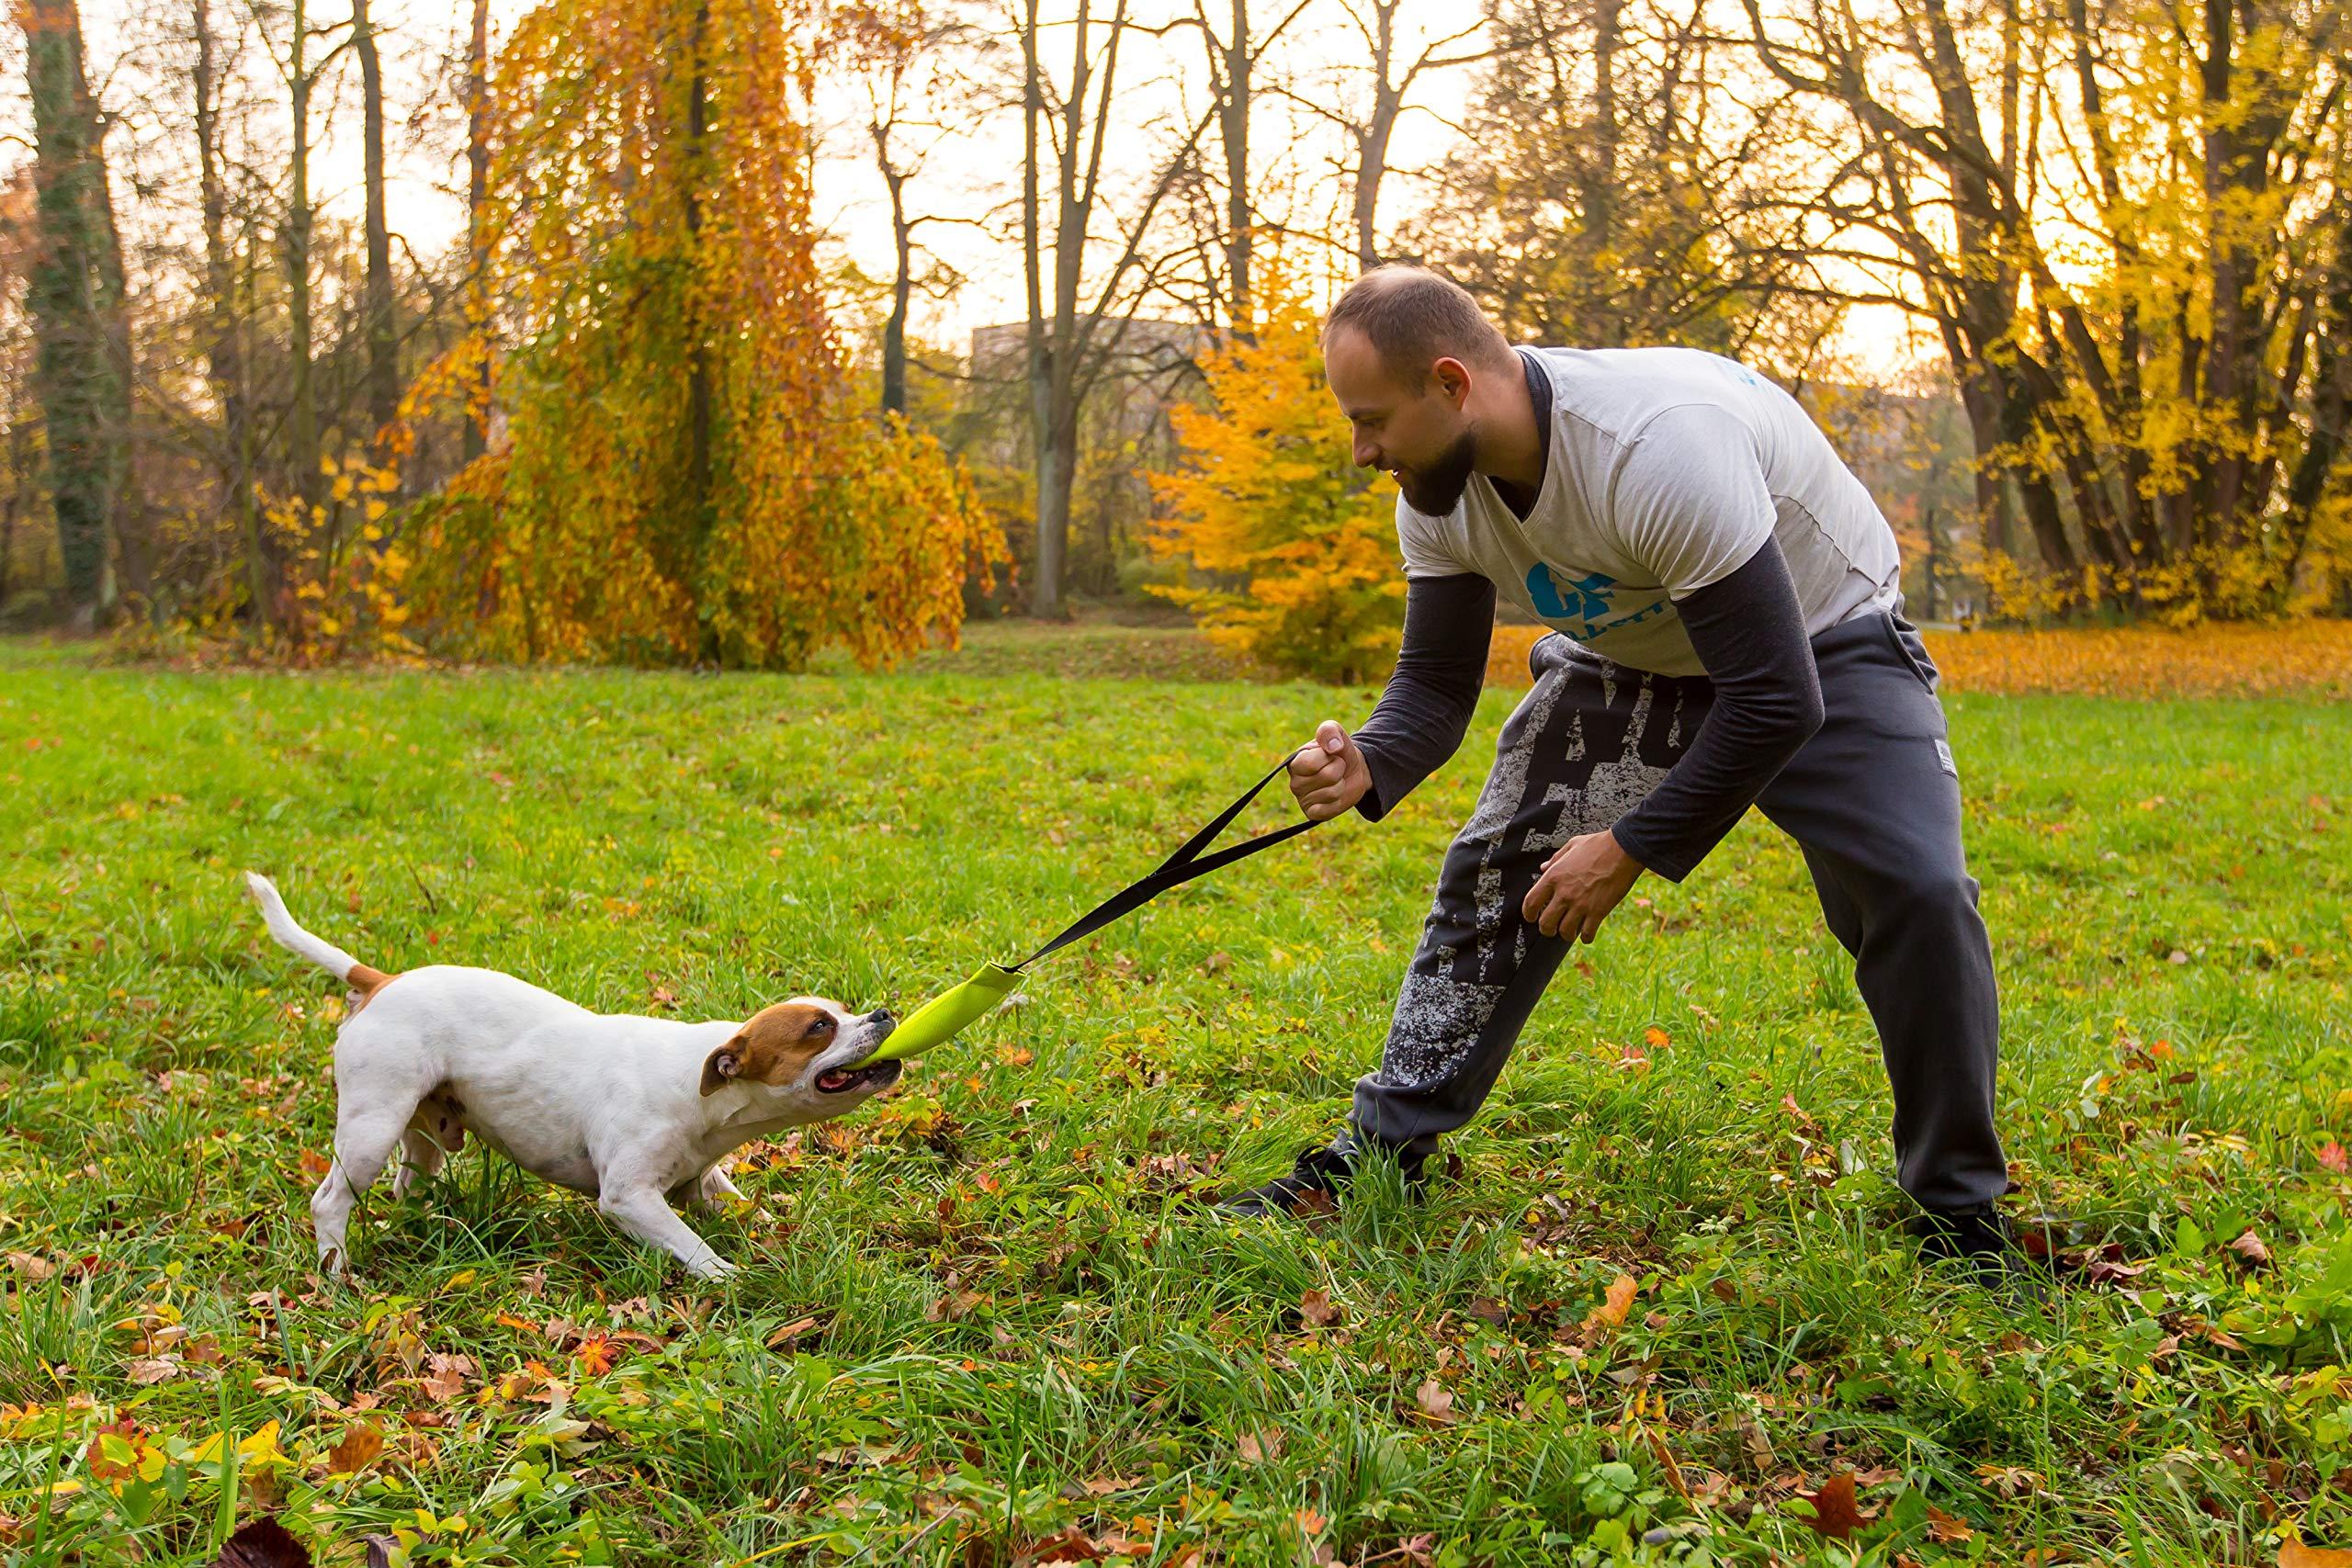 Bull Fit bungee mordedor perro, 25 cm Embutido de manguera